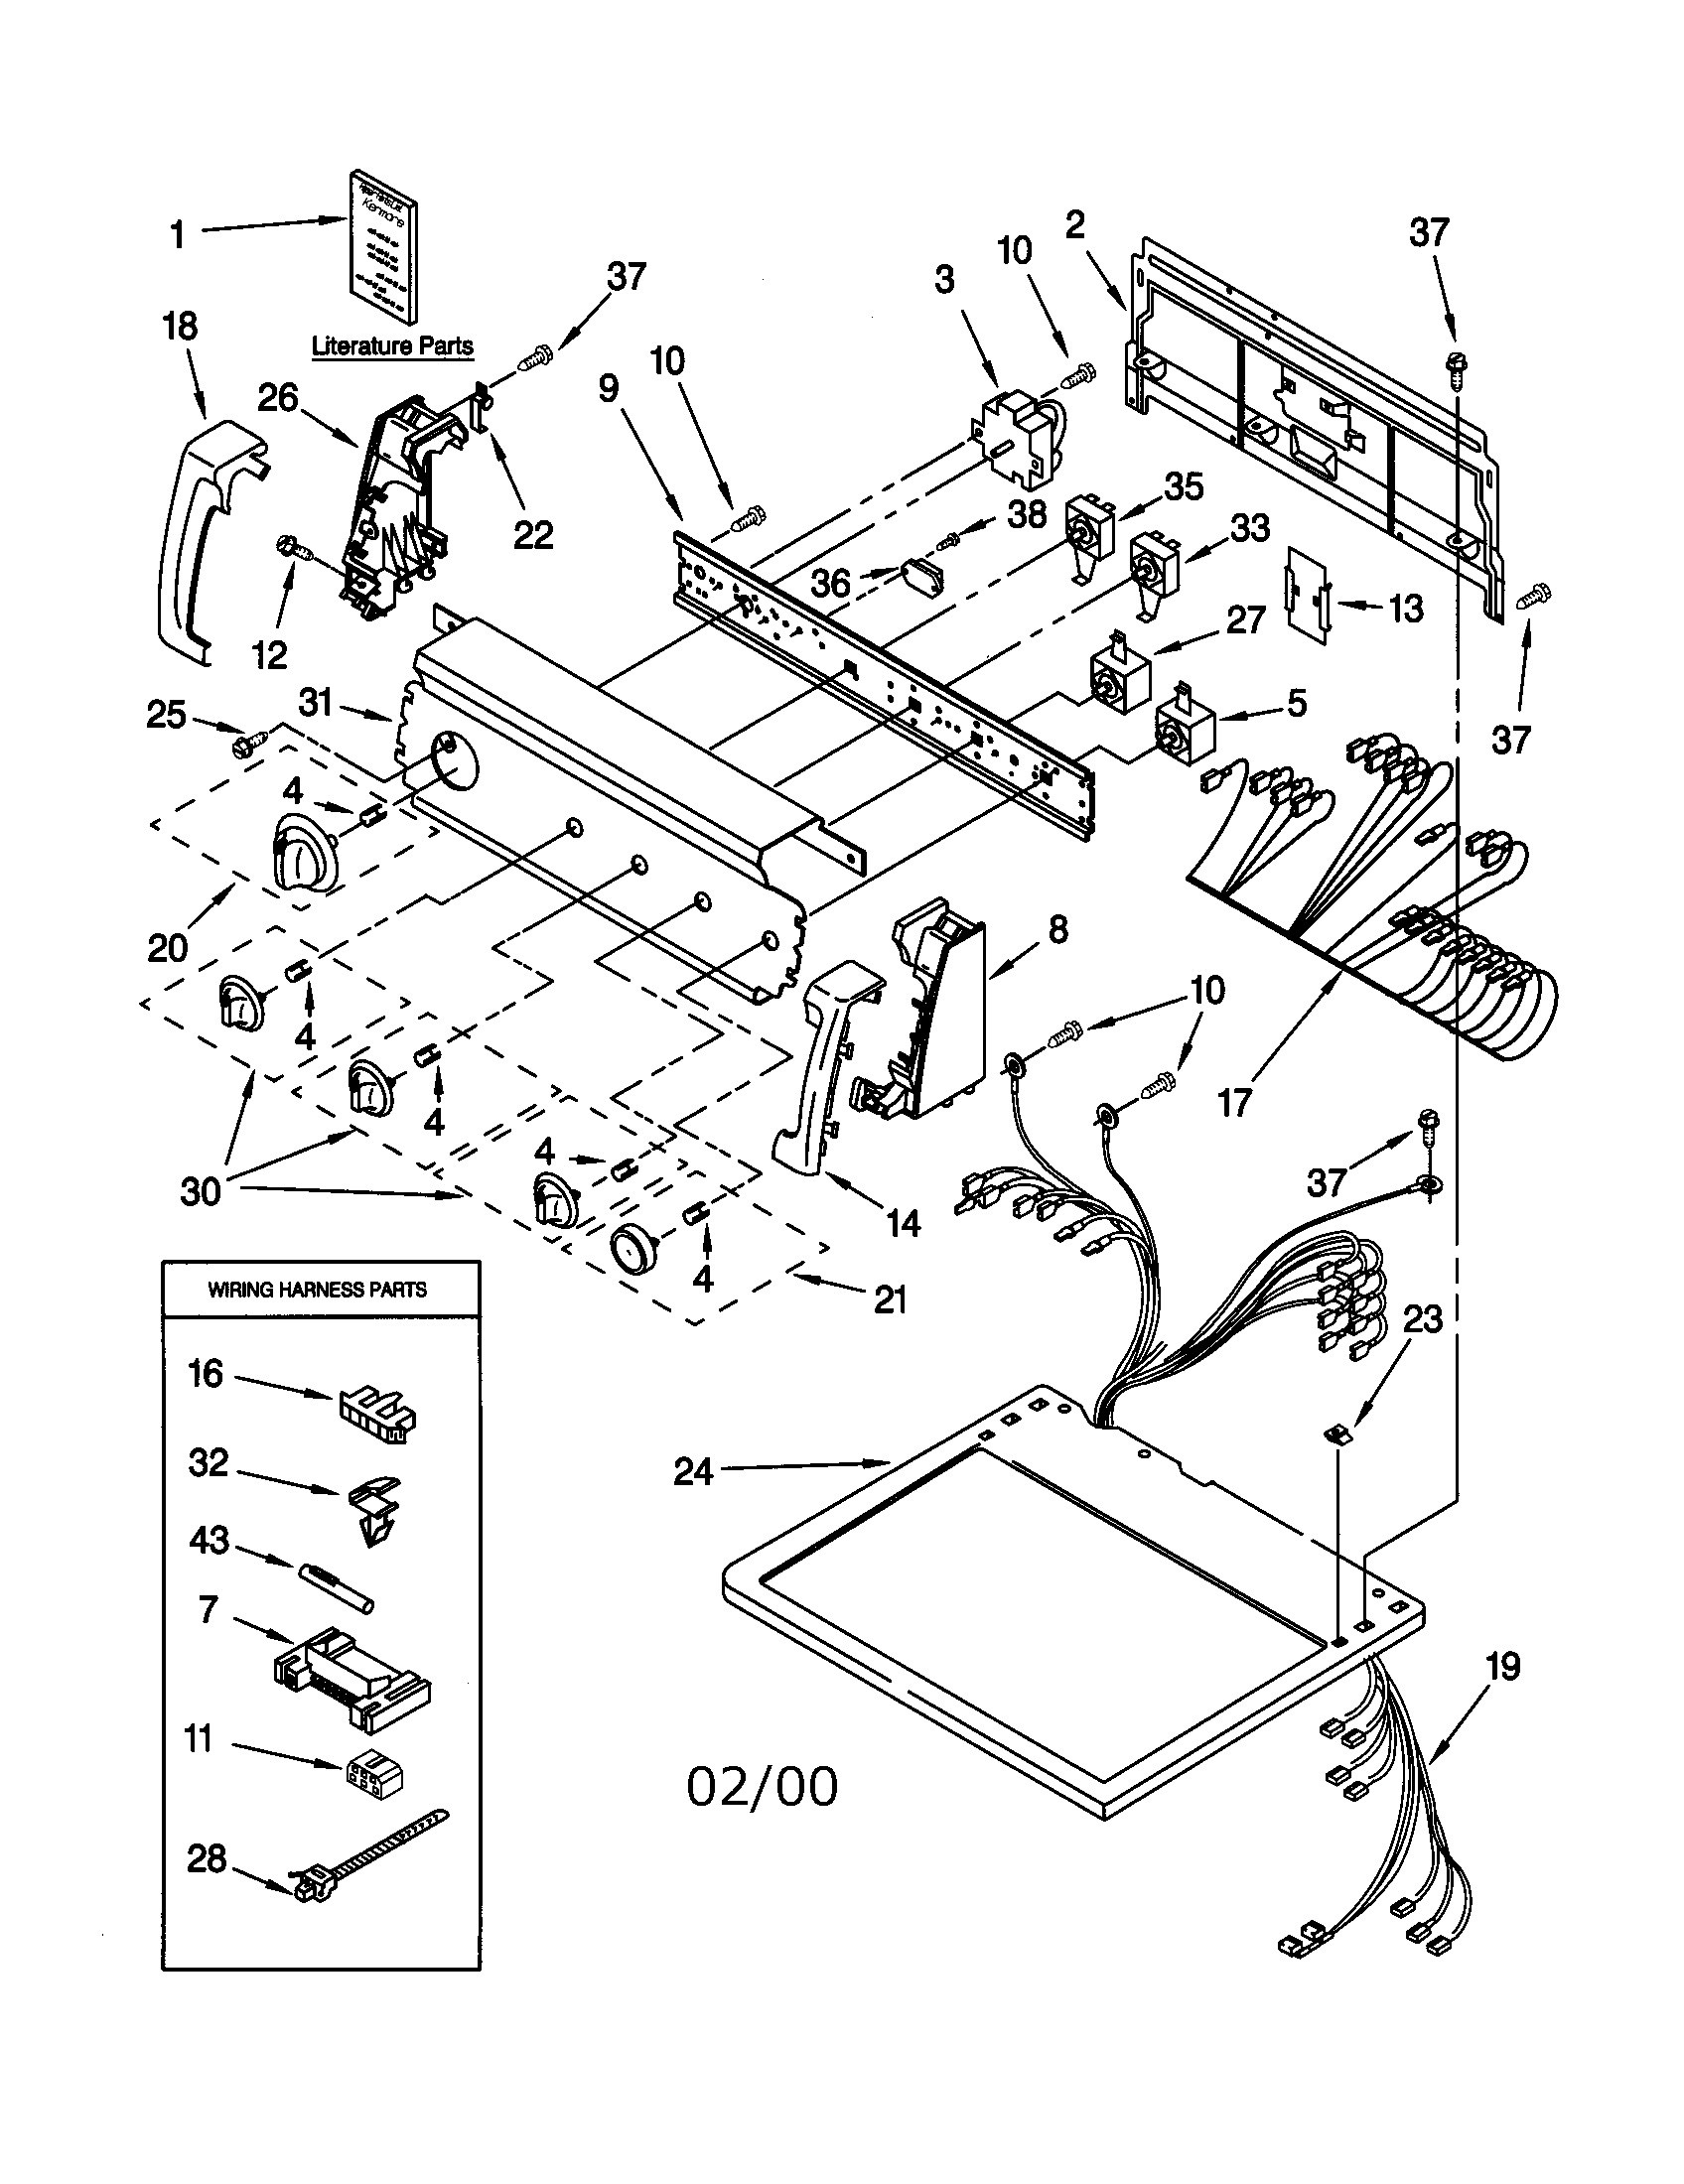 Blower Wheel Maytag Gas Dryer Parts Diagram, Blower, Free